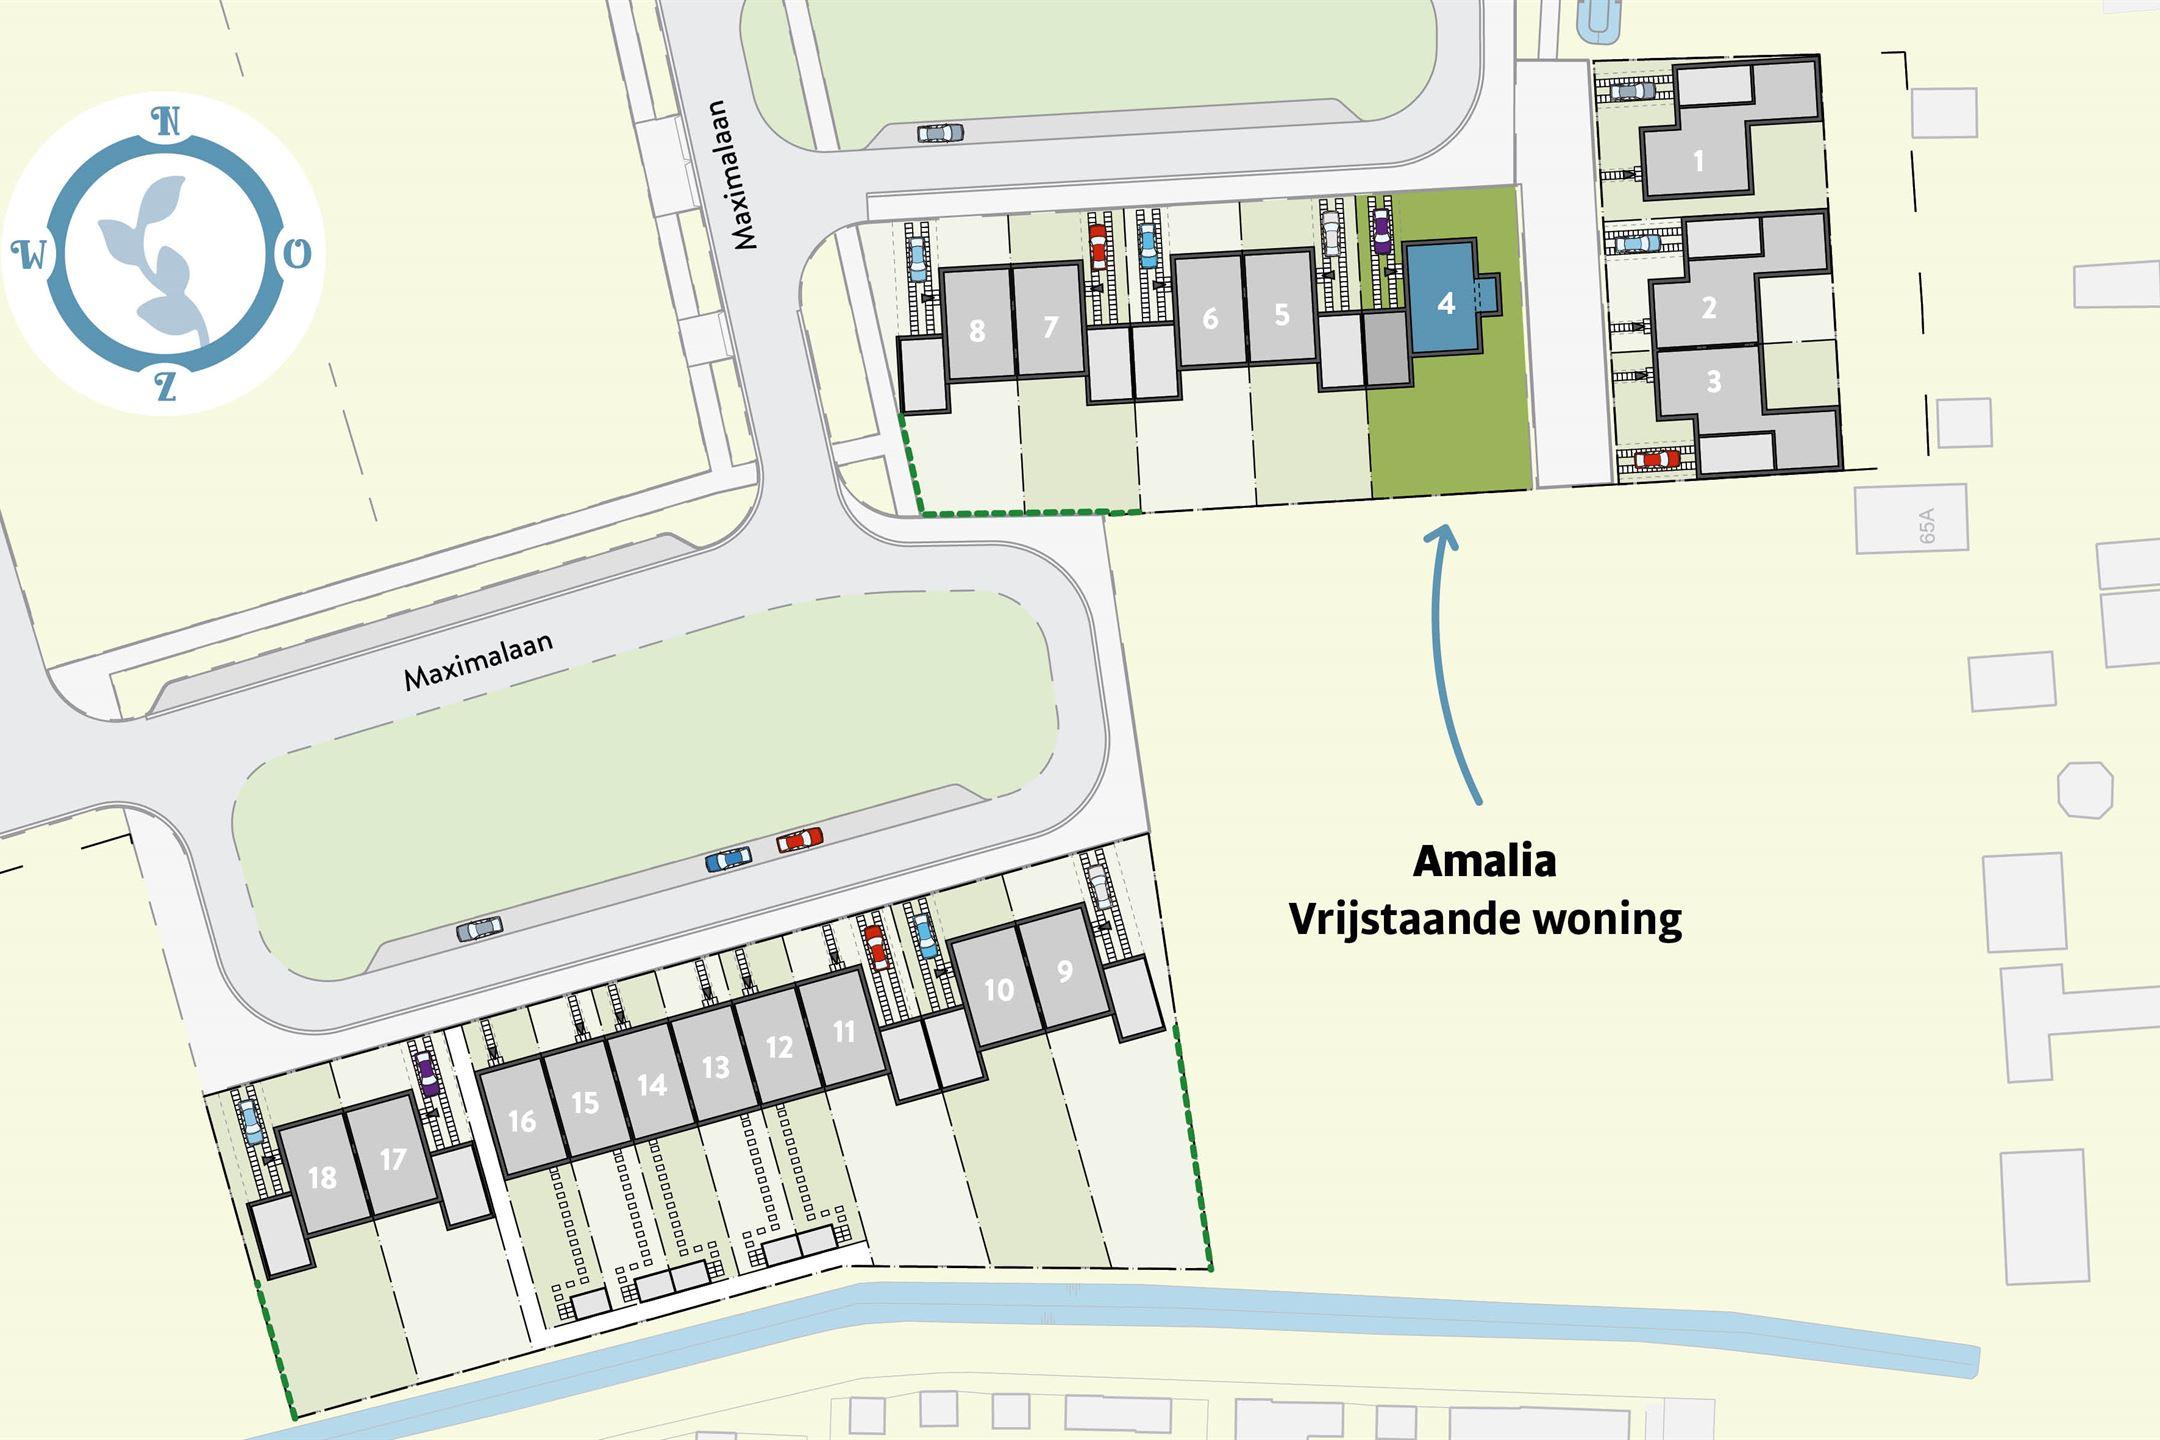 huis te koop gastels buiten amalia bouwnr 4 4750 ba oud